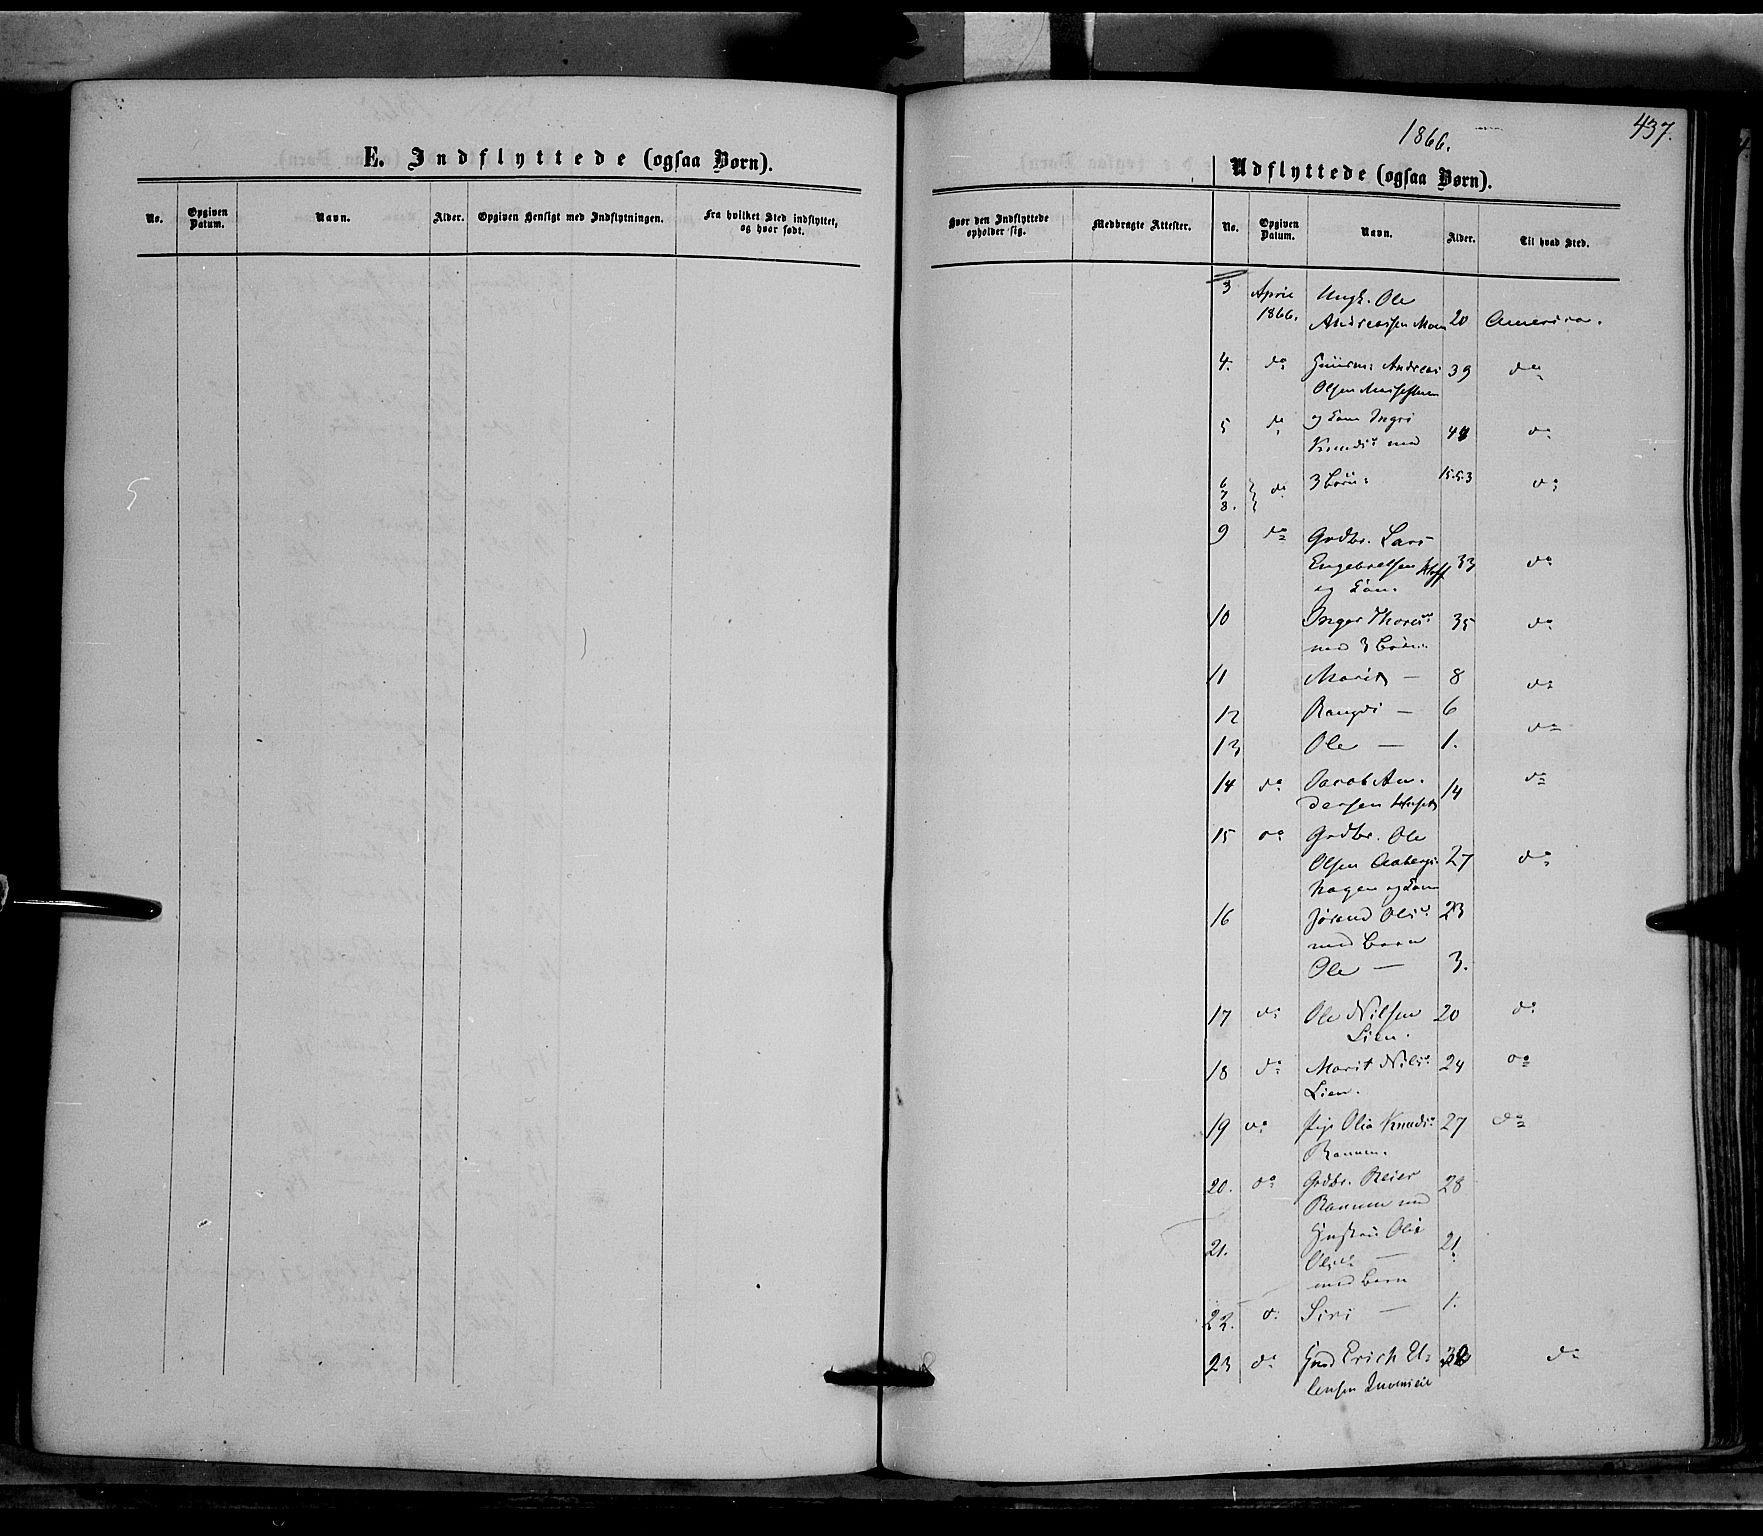 SAH, Nord-Aurdal prestekontor, Ministerialbok nr. 8, 1863-1875, s. 437